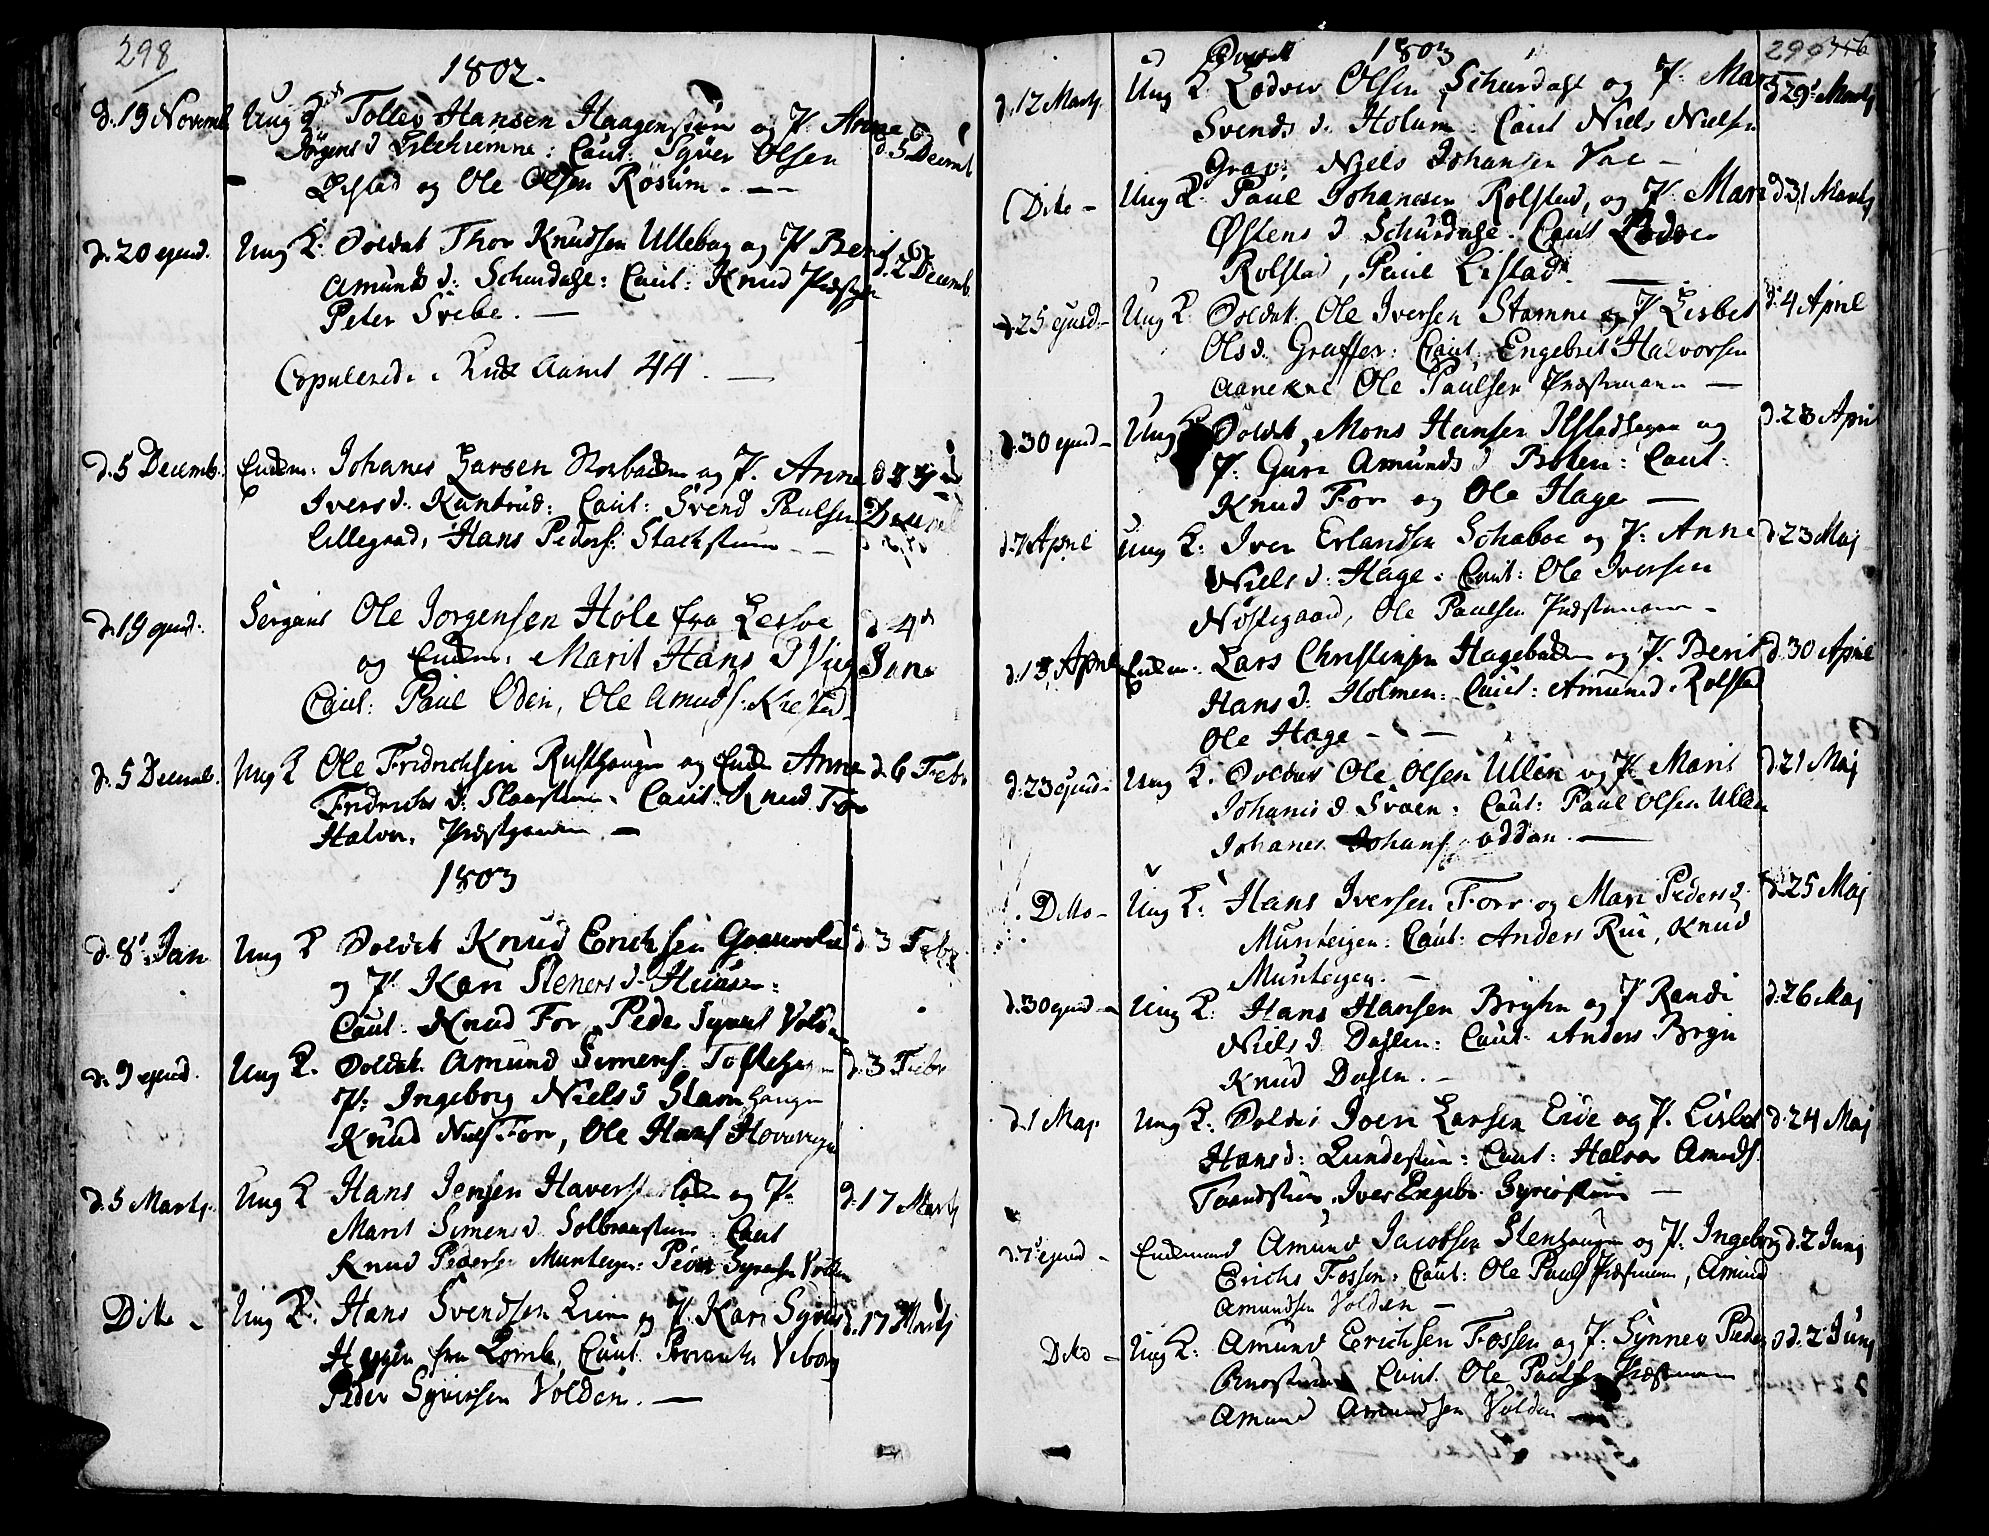 SAH, Fron prestekontor, H/Ha/Haa/L0001: Ministerialbok nr. 1, 1799-1816, s. 298-299